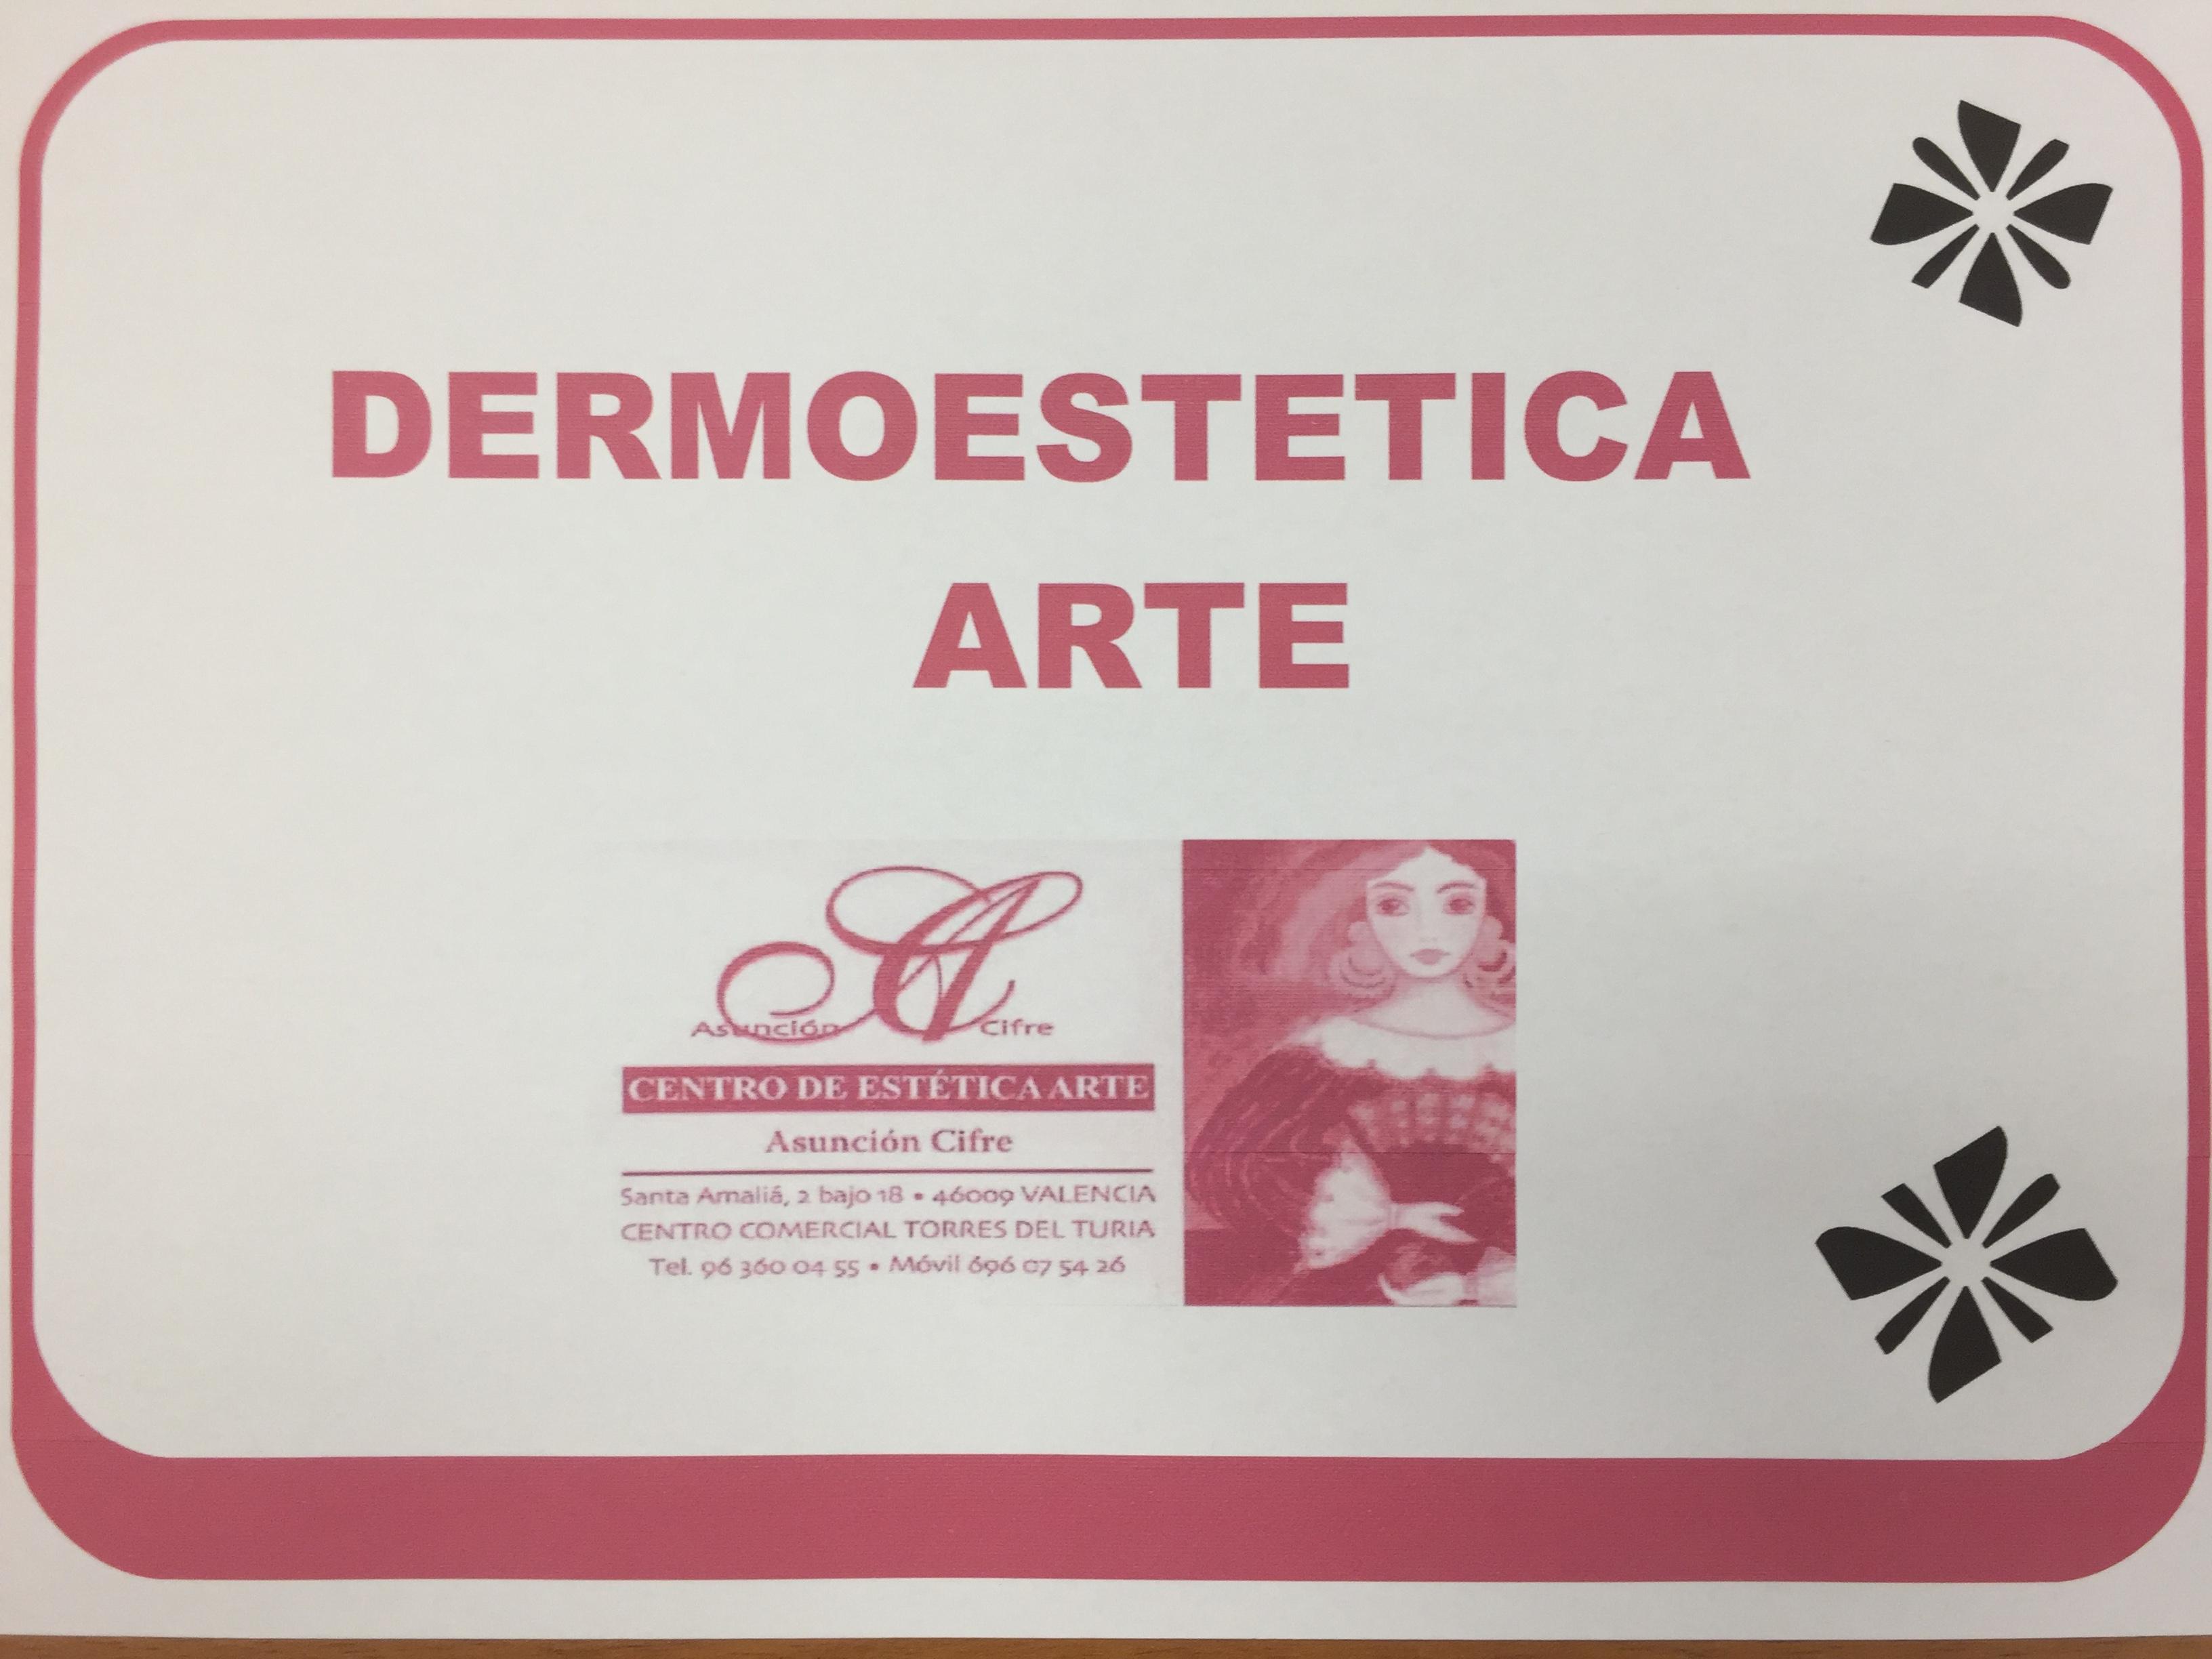 DERMOESTETICA ARTE